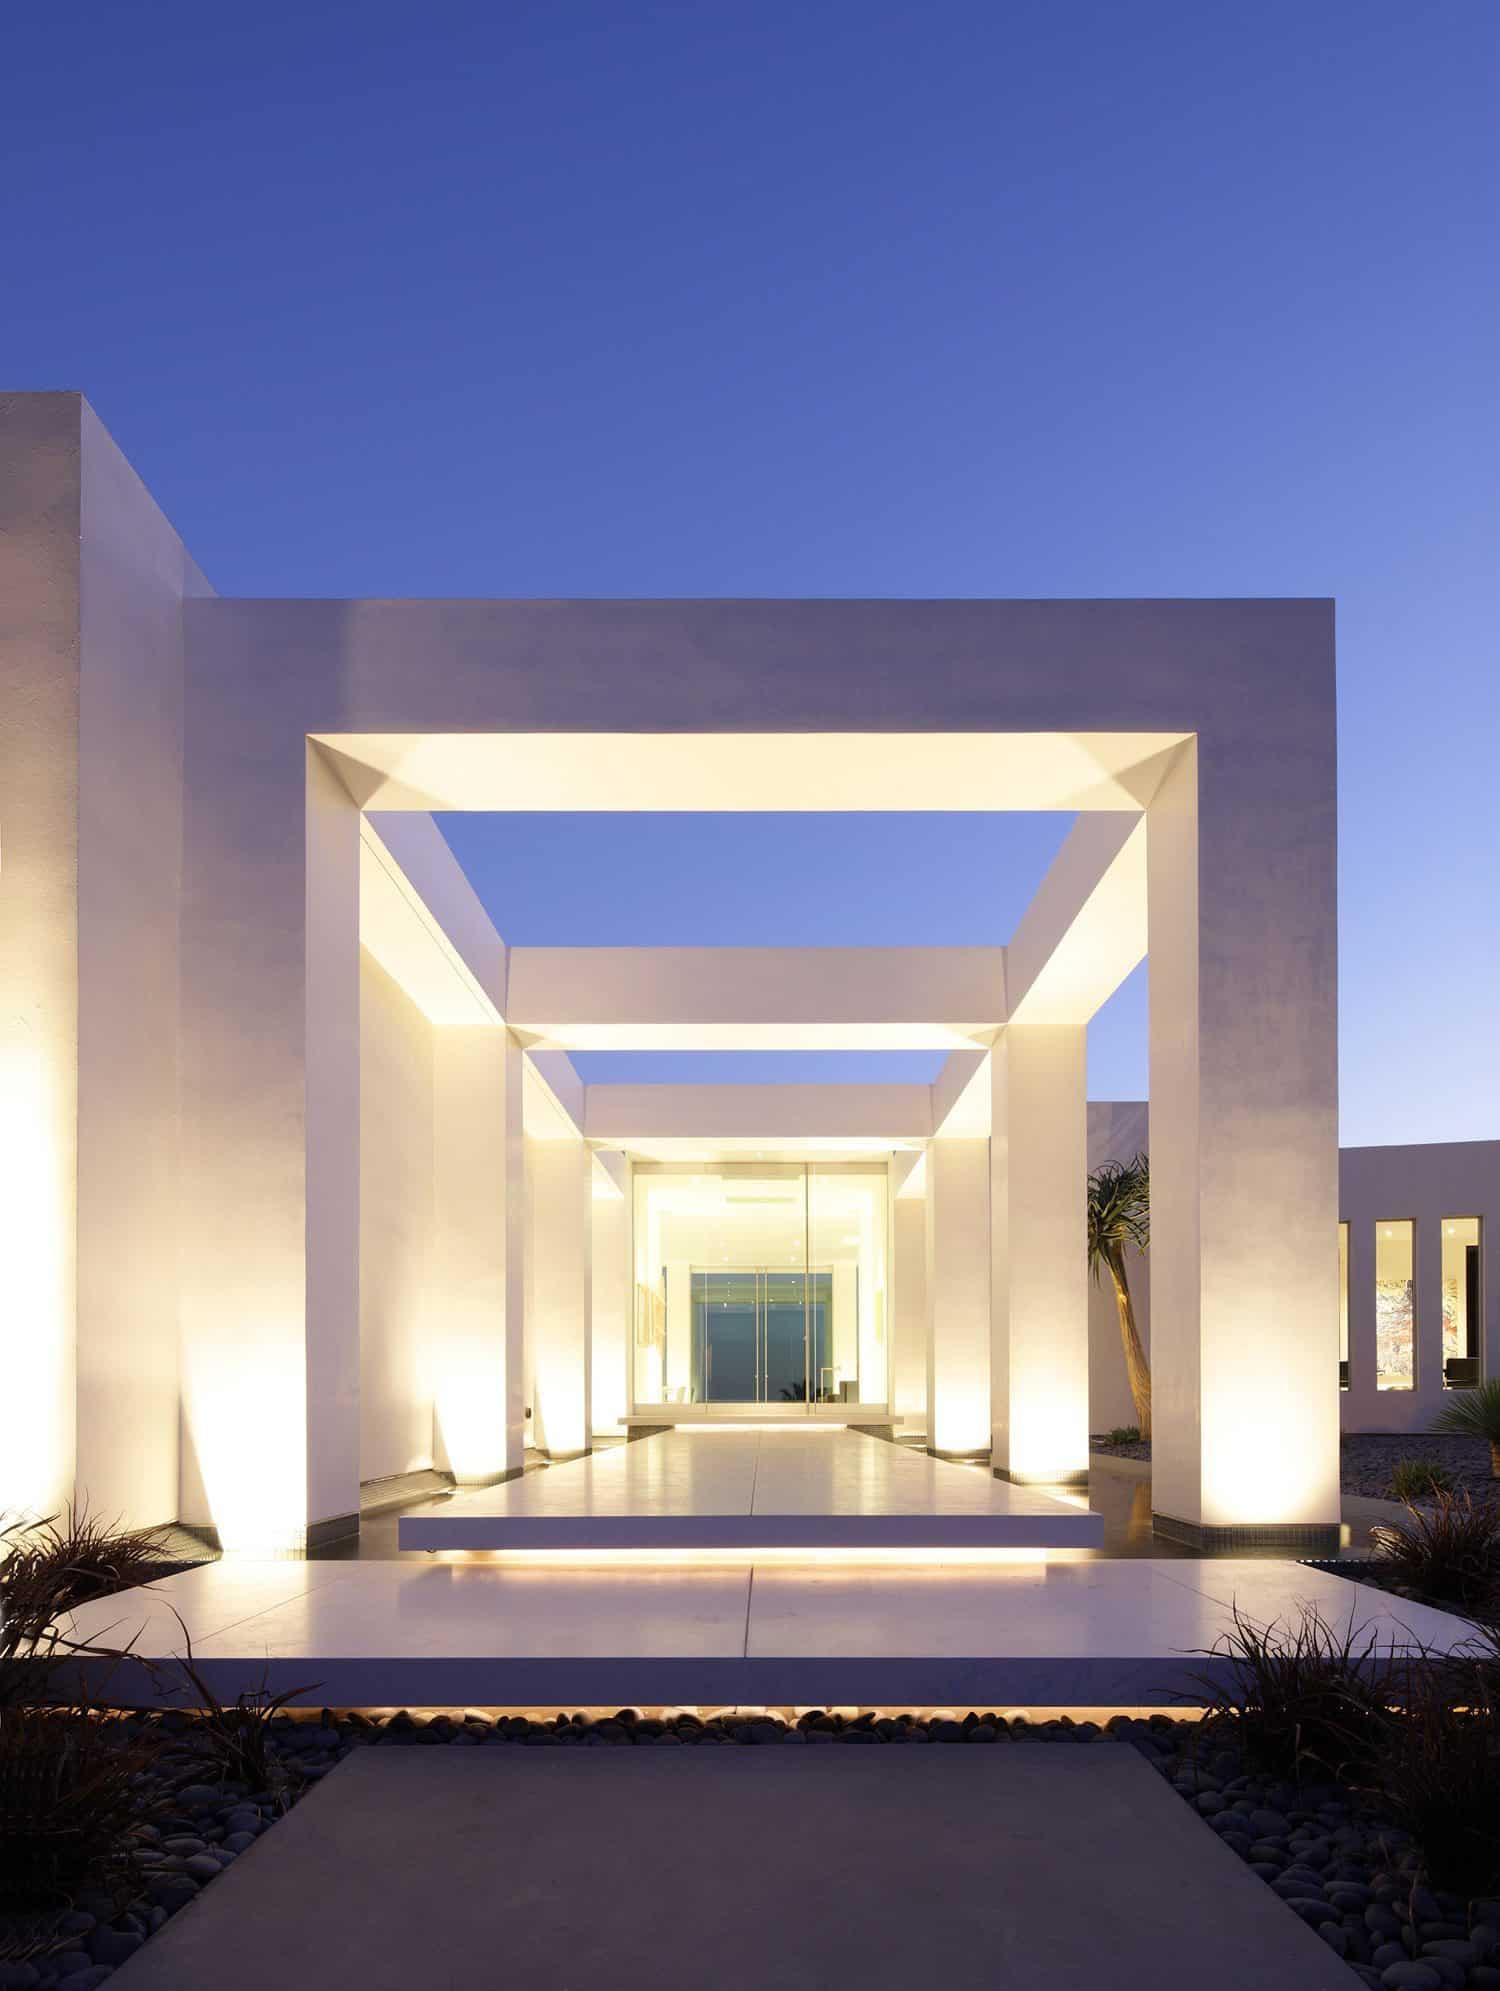 Modern-Residence-Architecture-Magni Design-06-1 Kindesign